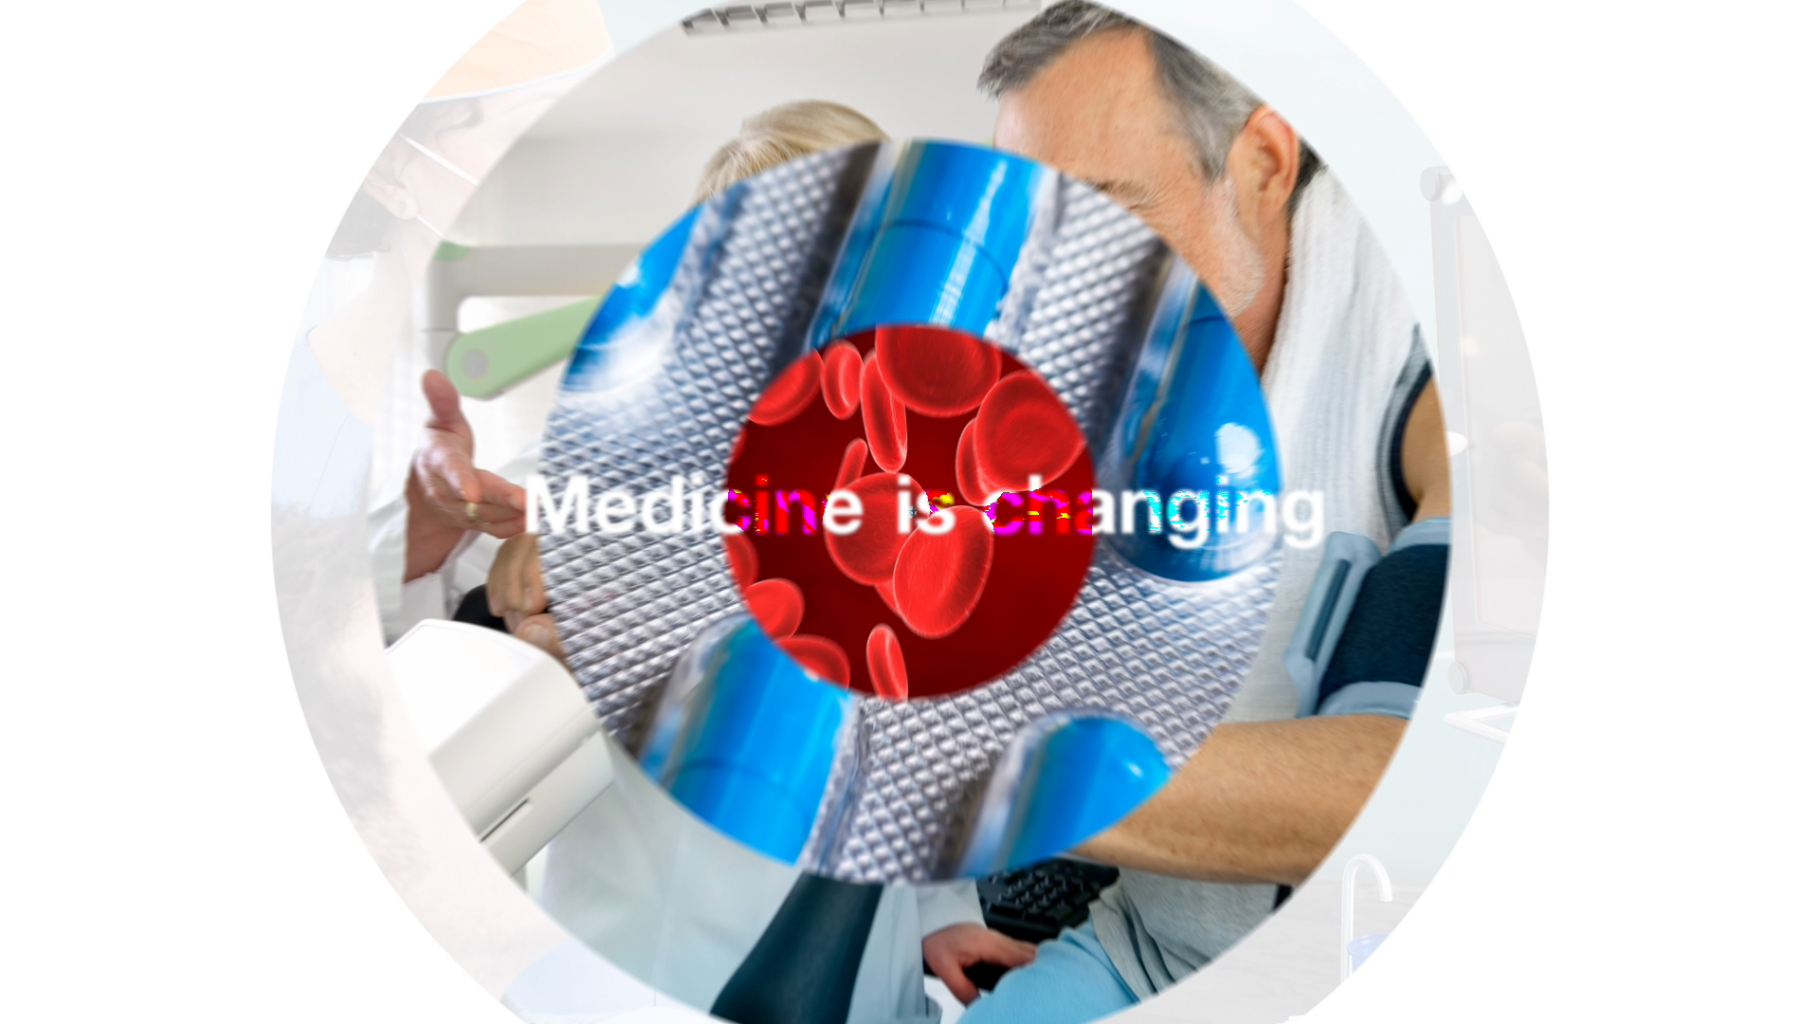 University of Bristol – New Medical Curriculum Launch